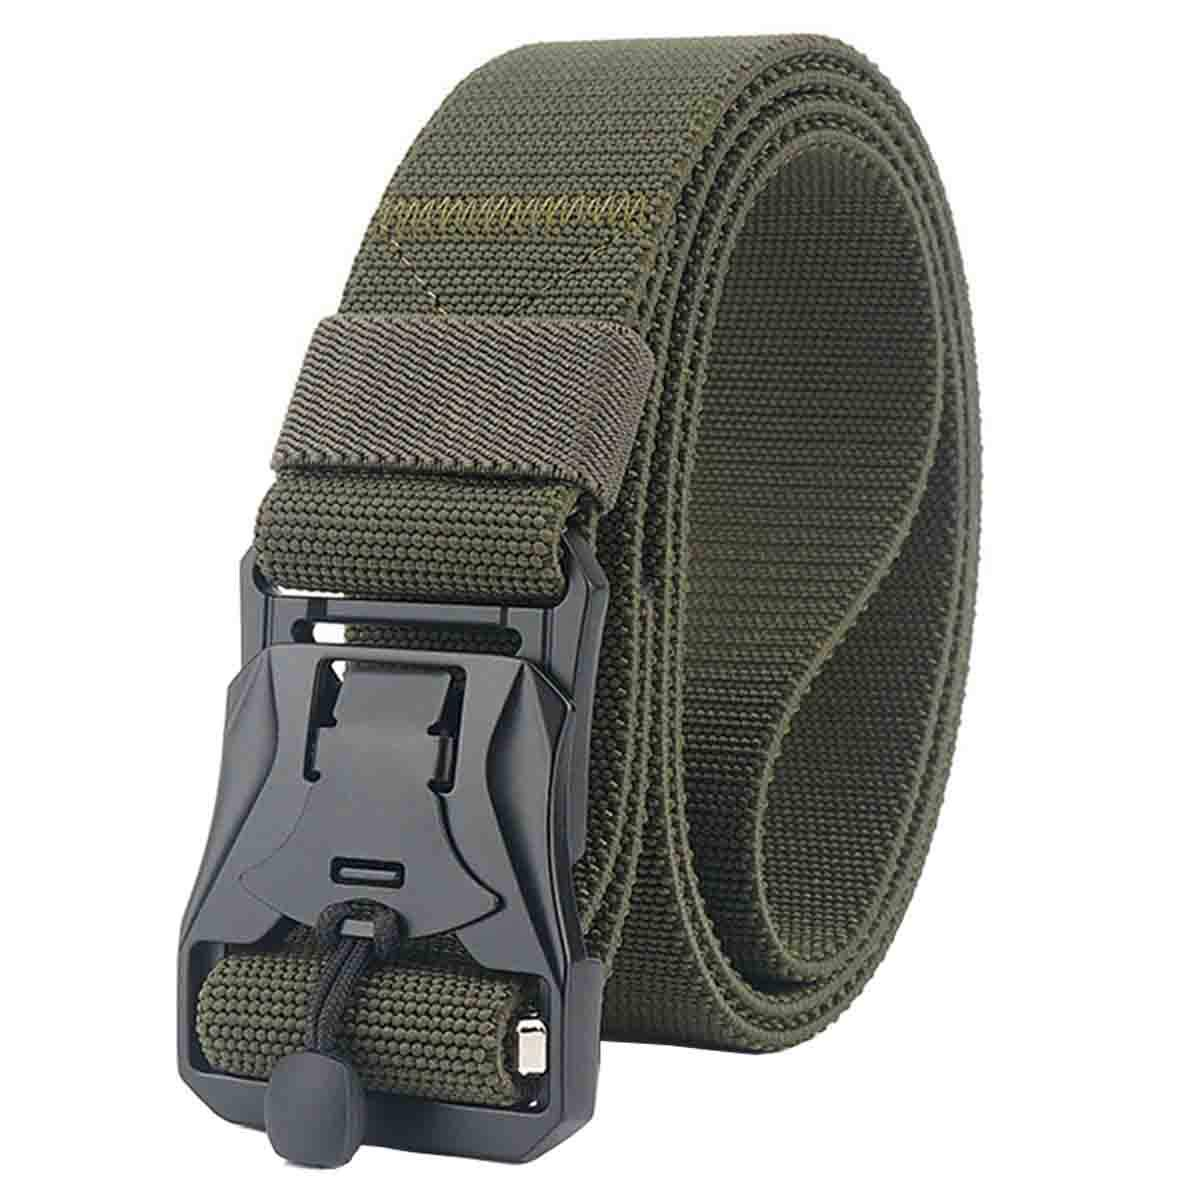 NiceShop16 Tactical Elastic Belt 1.5\